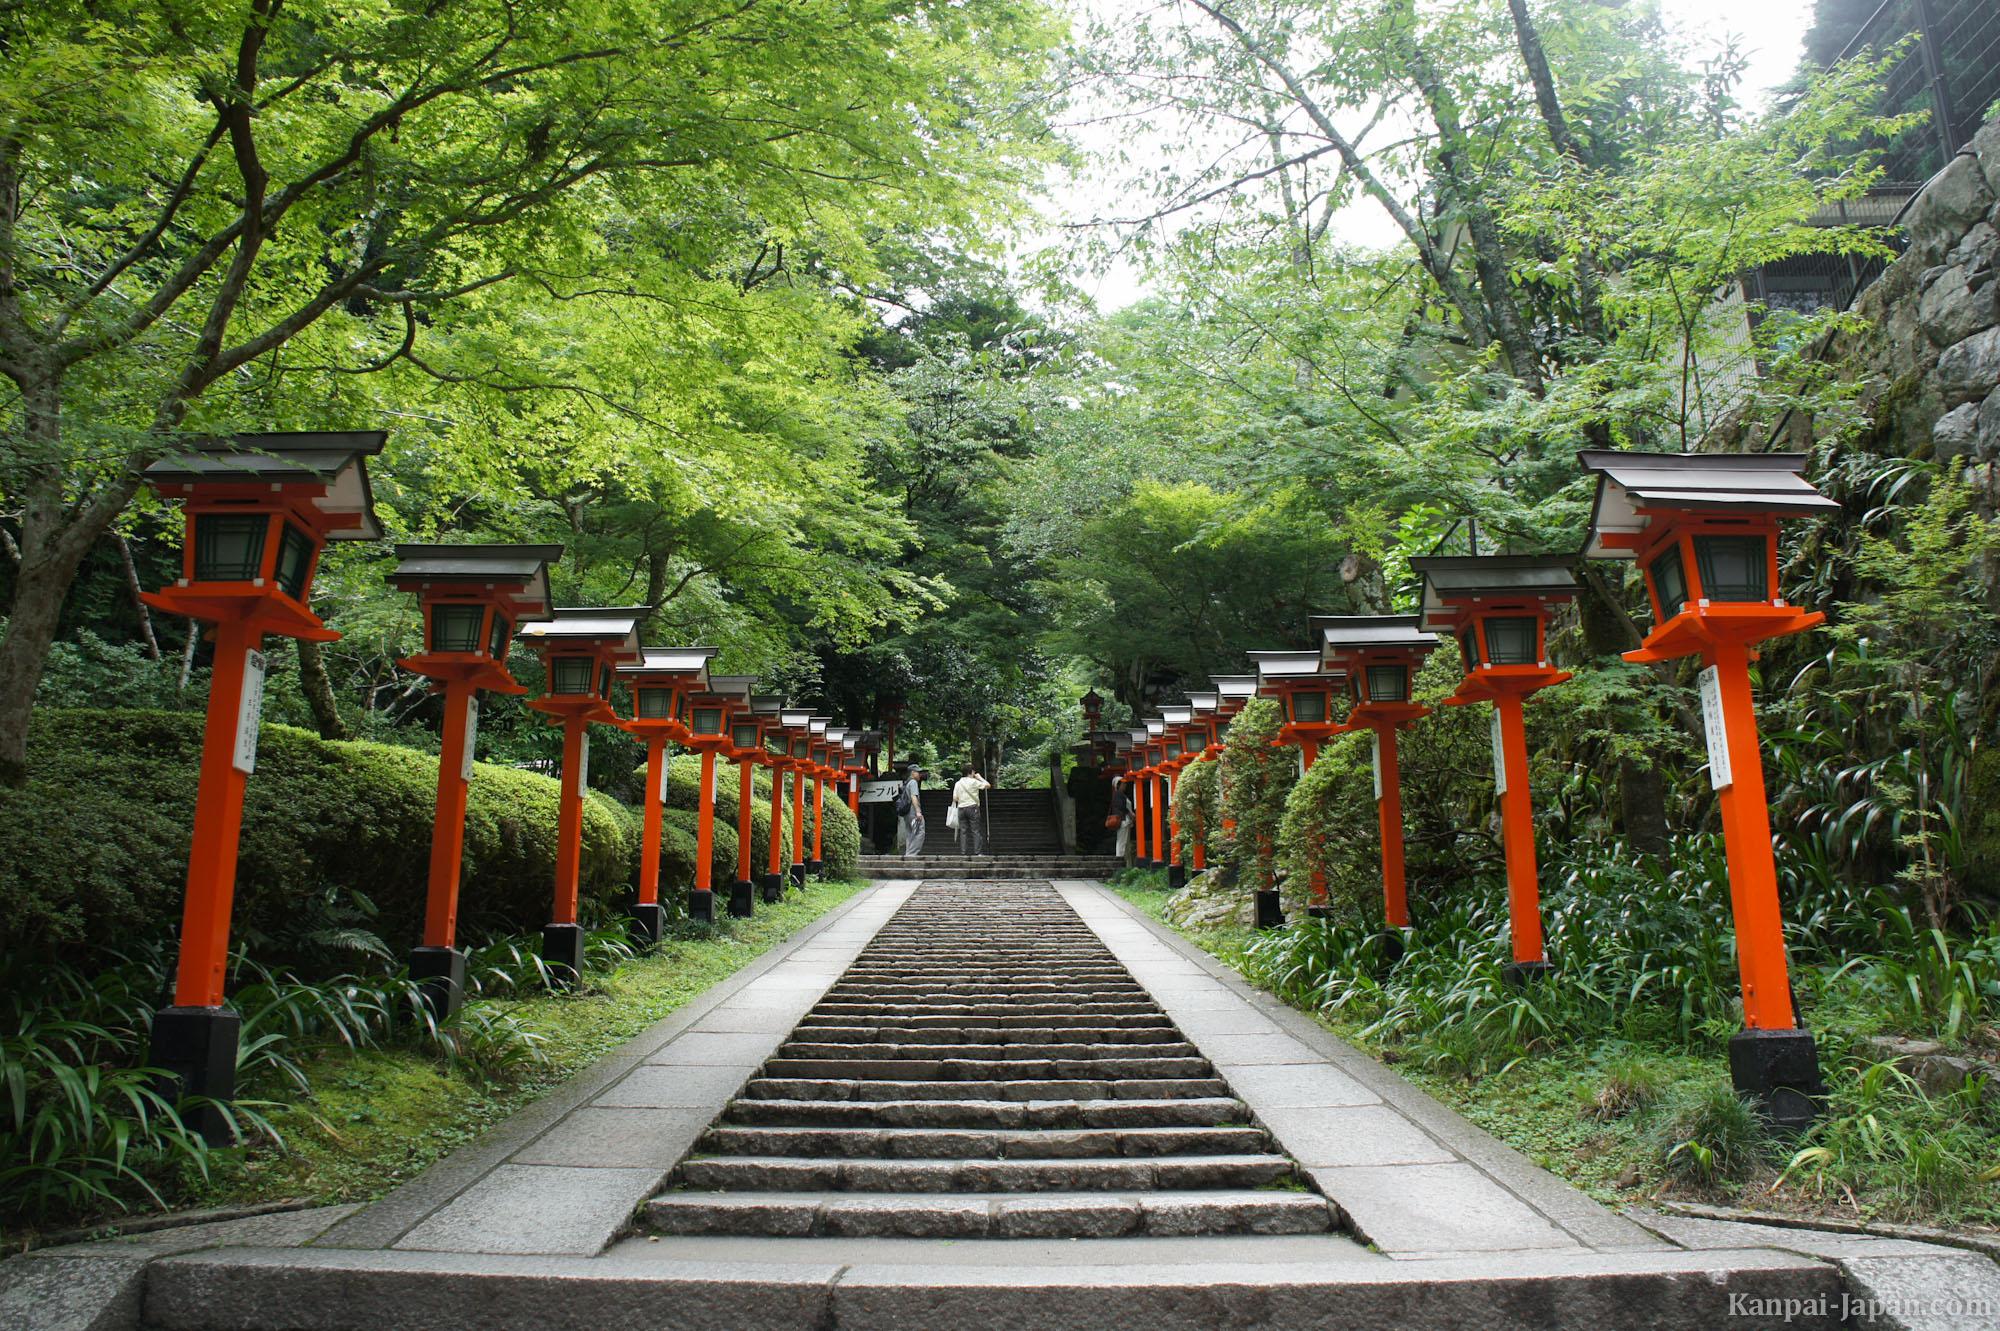 Mount Kurama - The sublime Zen visit north of Kyoto